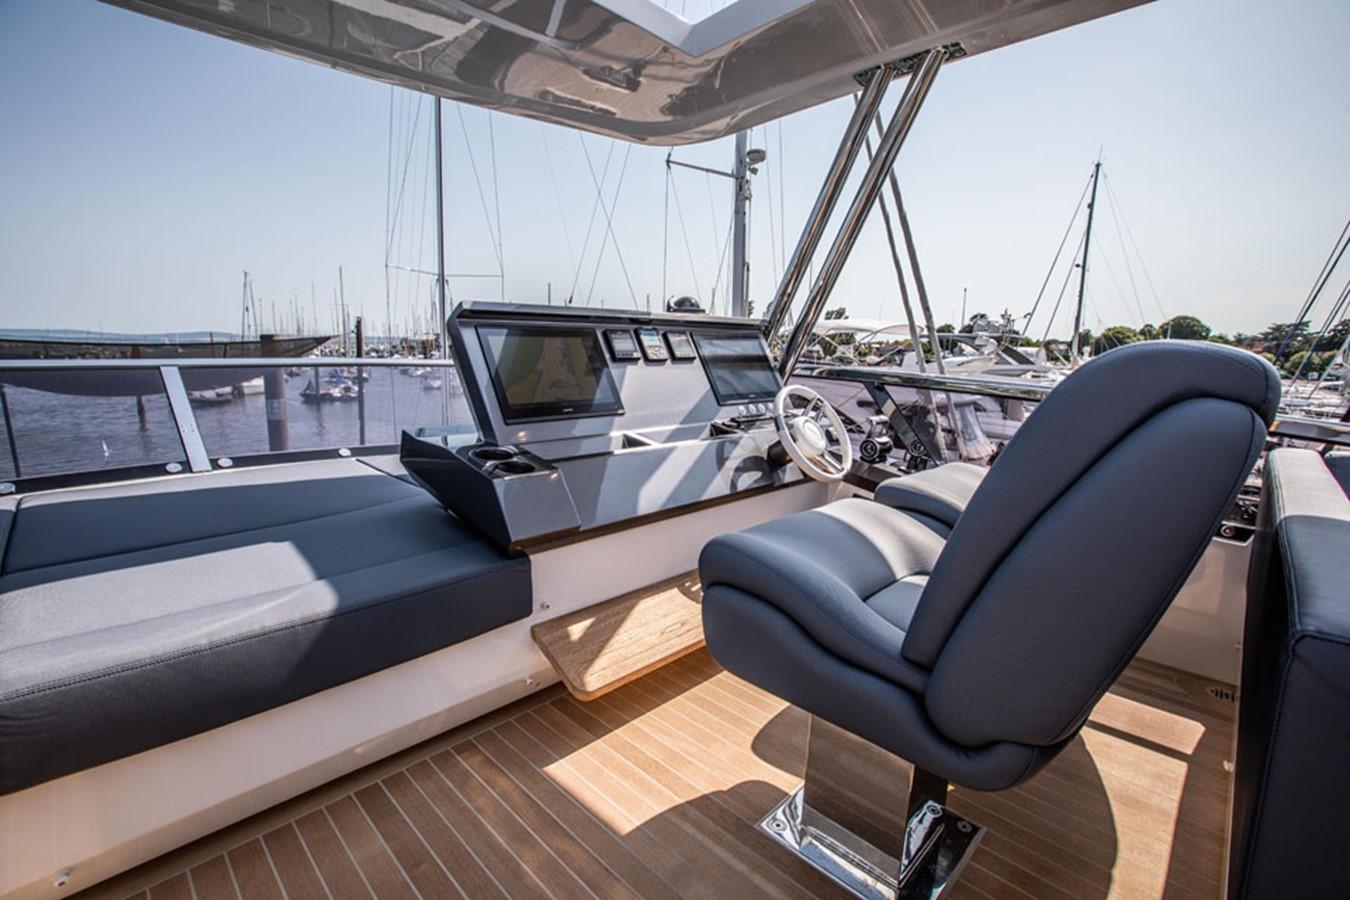 2019 PEARL MOTOR YACHTS Pearl 80 Motor Yacht 2615339